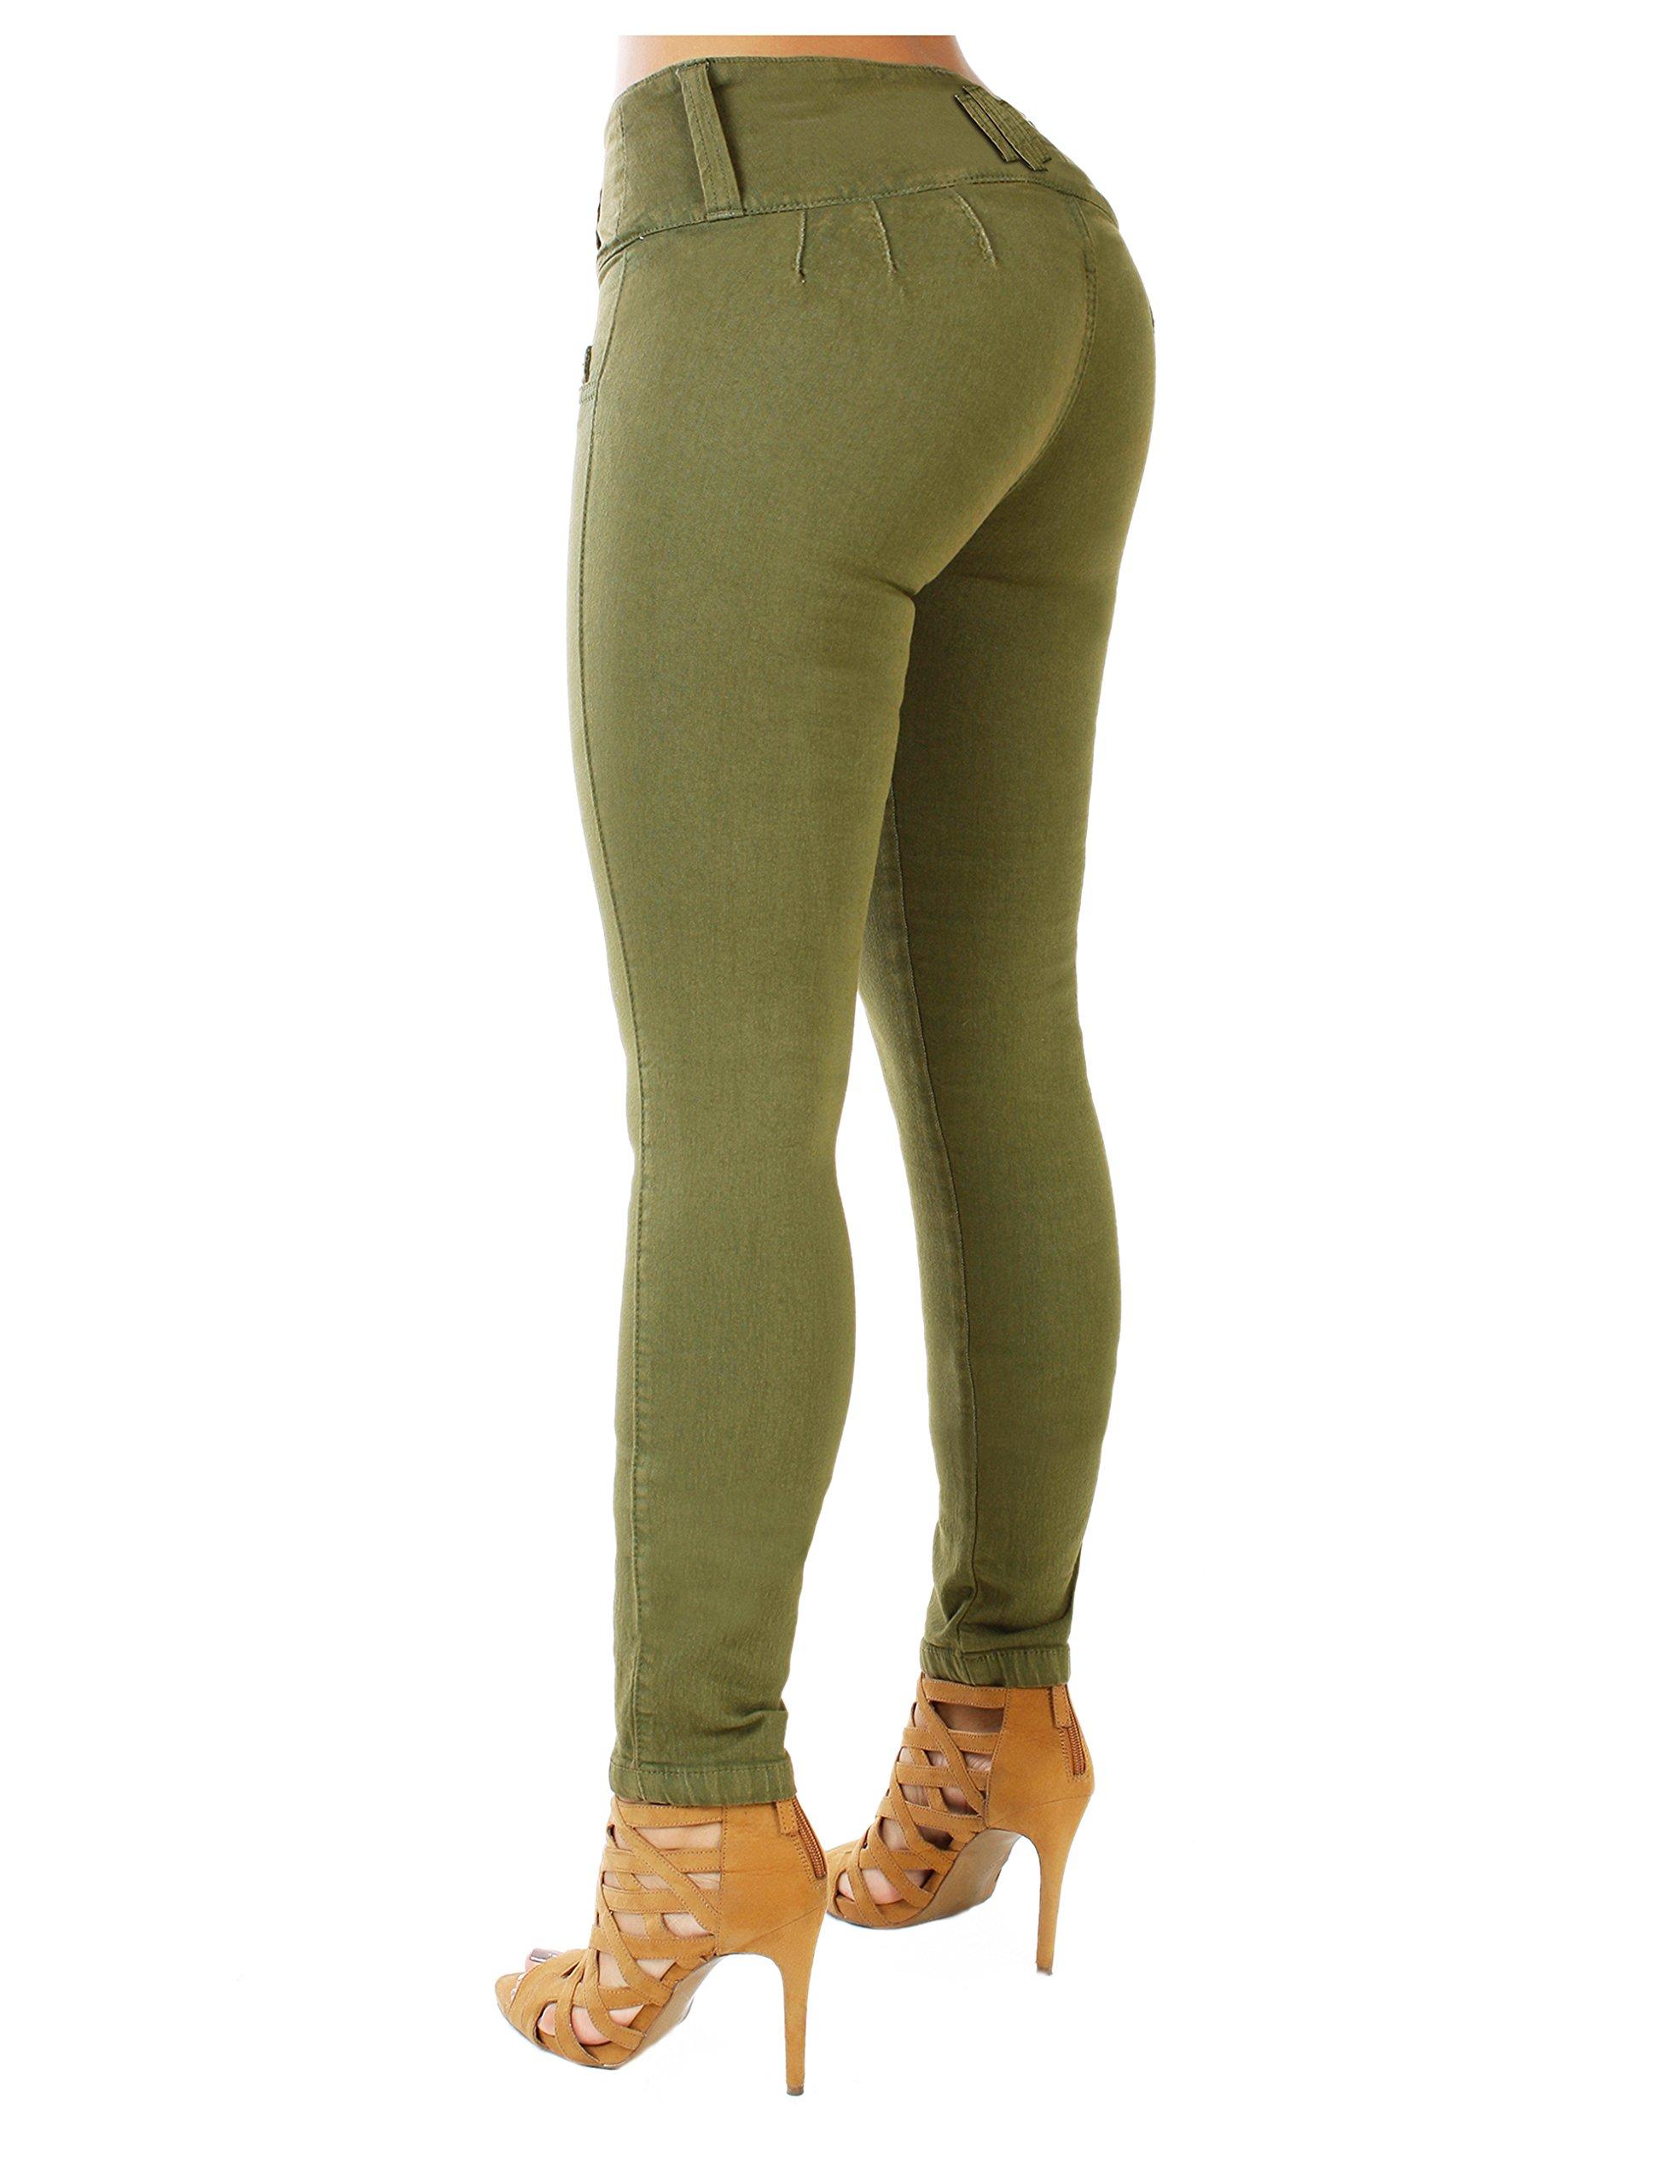 Curvify 765 Premium Women's Enhanced Butt Liftting Skinny Jeans (765-Olive-11)